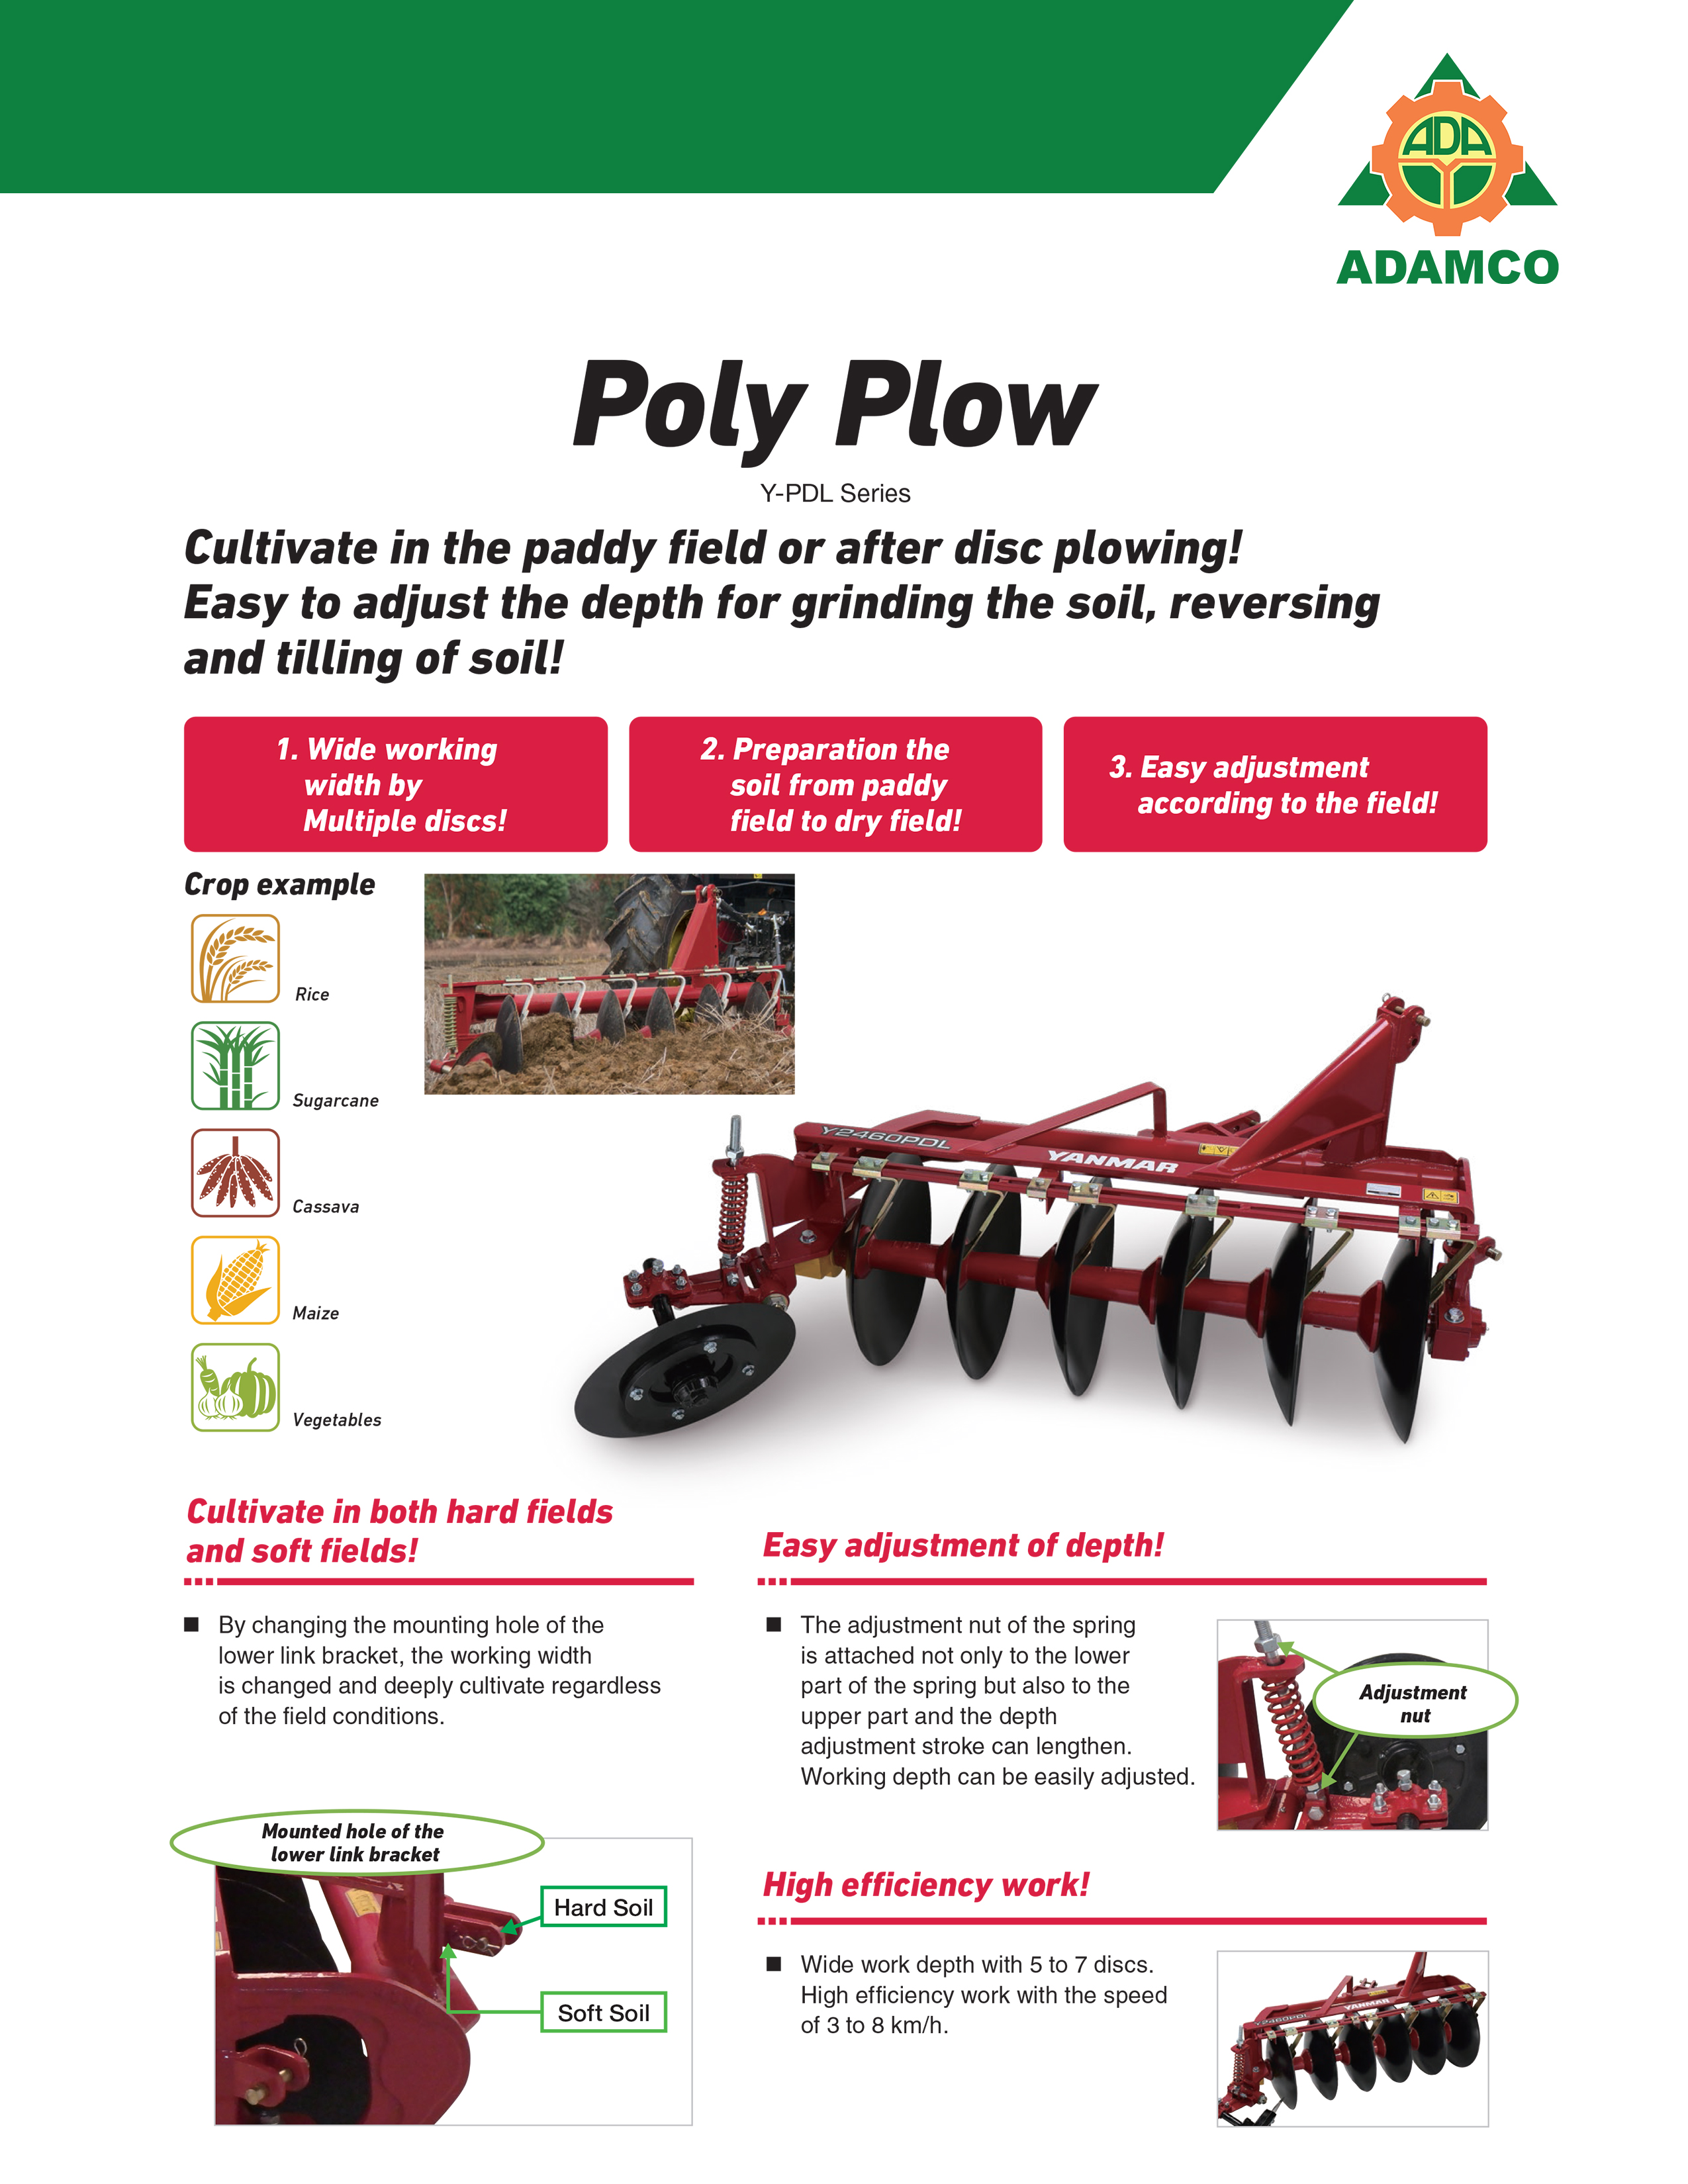 Poly Plow YPDL 1